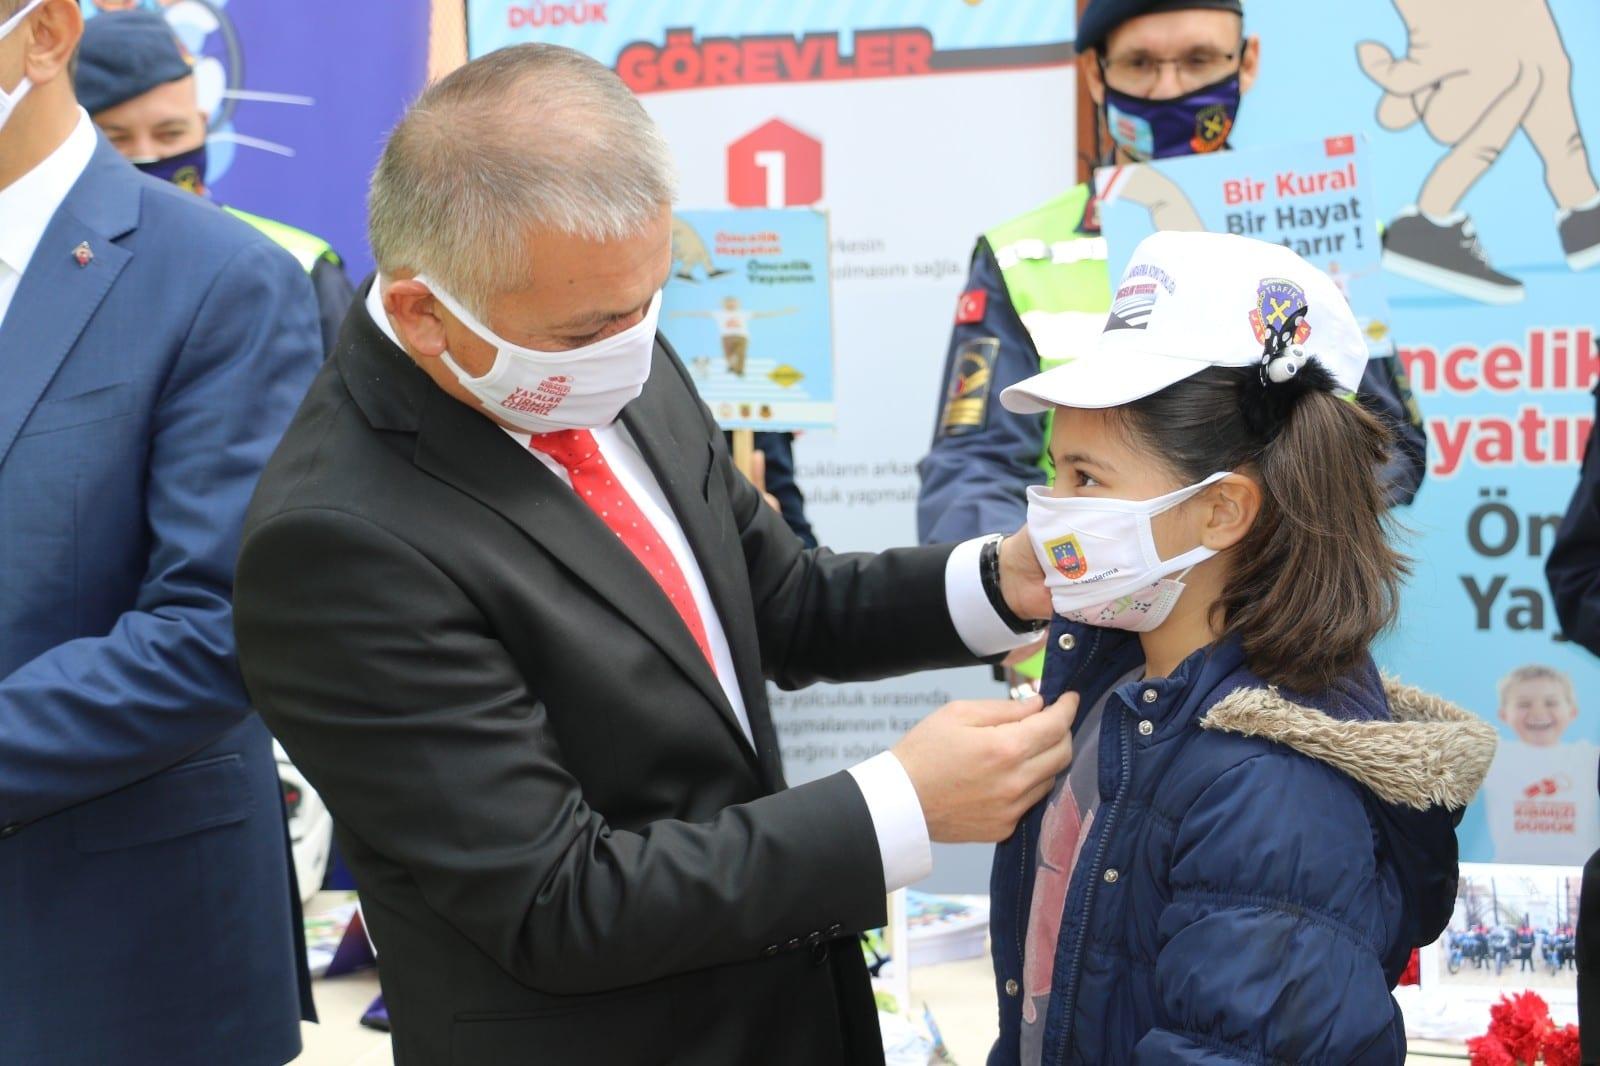 vali yazici biz turizm sehriyiz turkiyeyi temsil eden bir sehriz risk haritasinda kirmizi bize yakismadi 6 iO8QLIU8